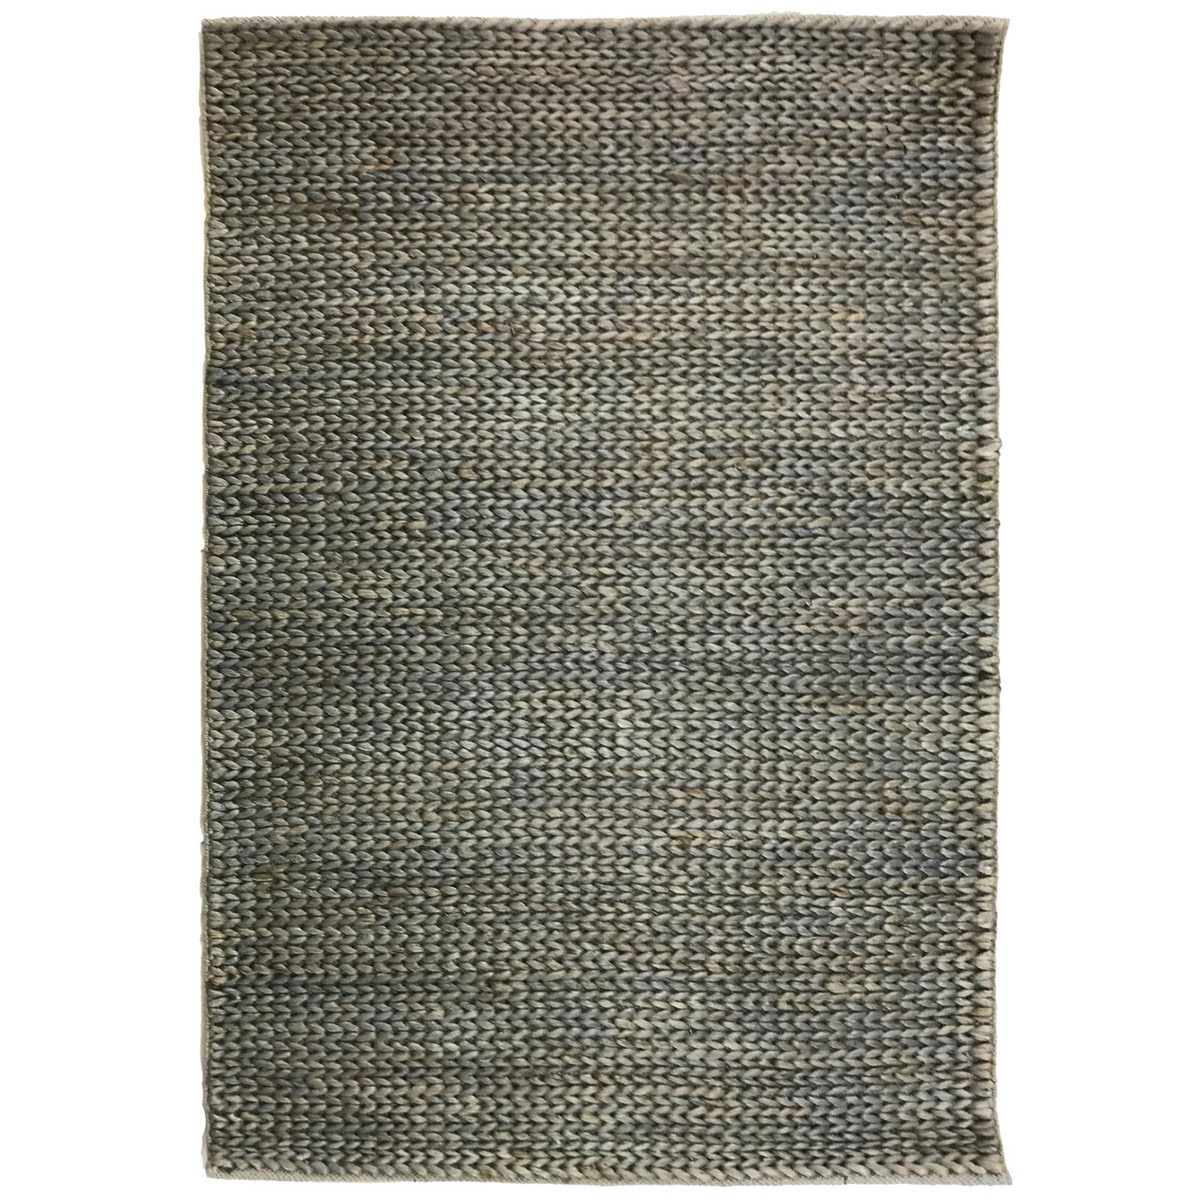 Mamda Hand Braided Jute Rug, 160x110cm, Grey Wash